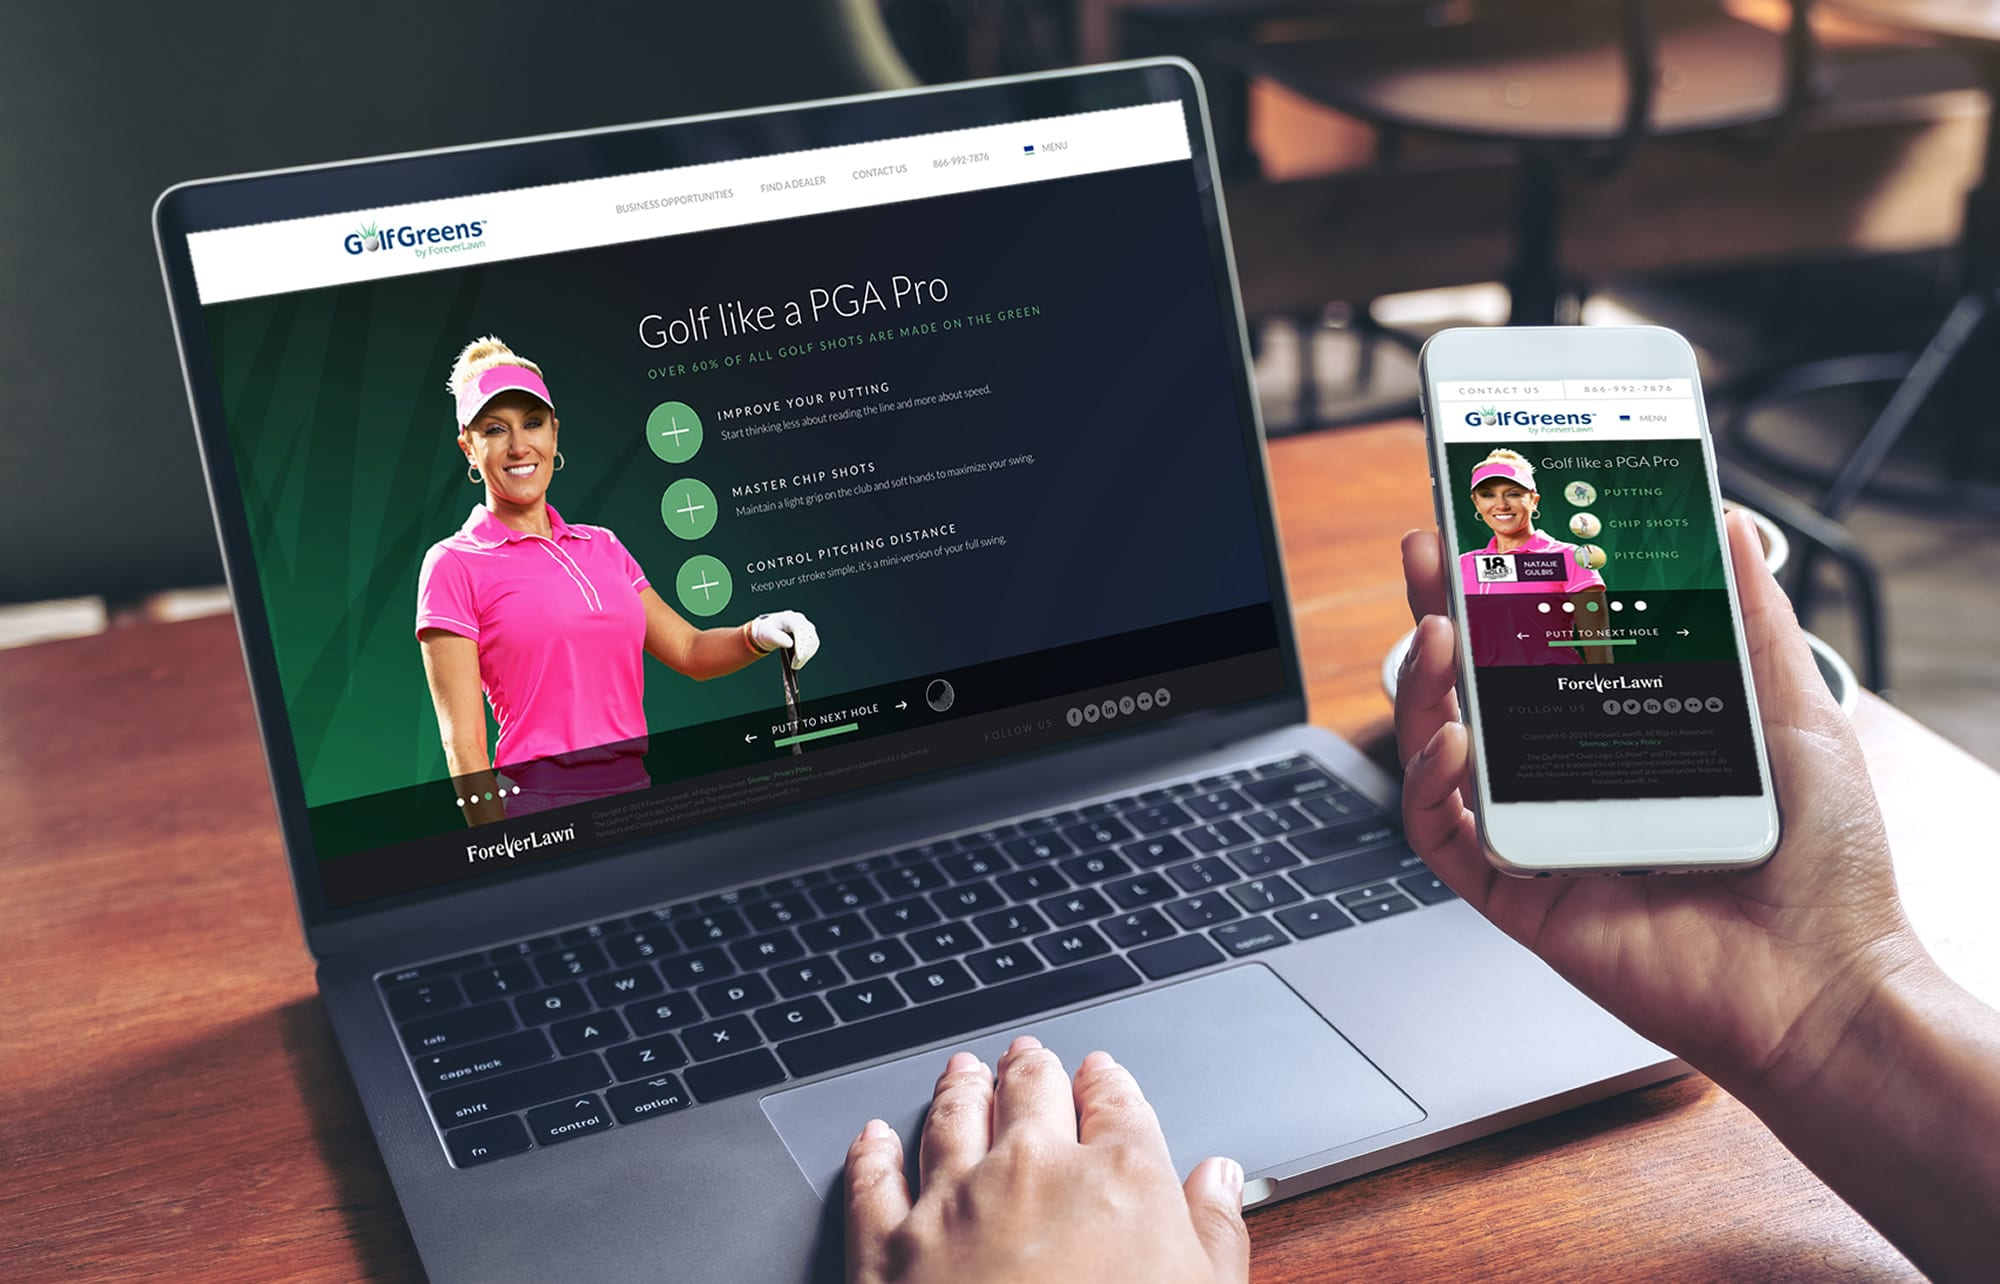 6-golfgreens-desktop